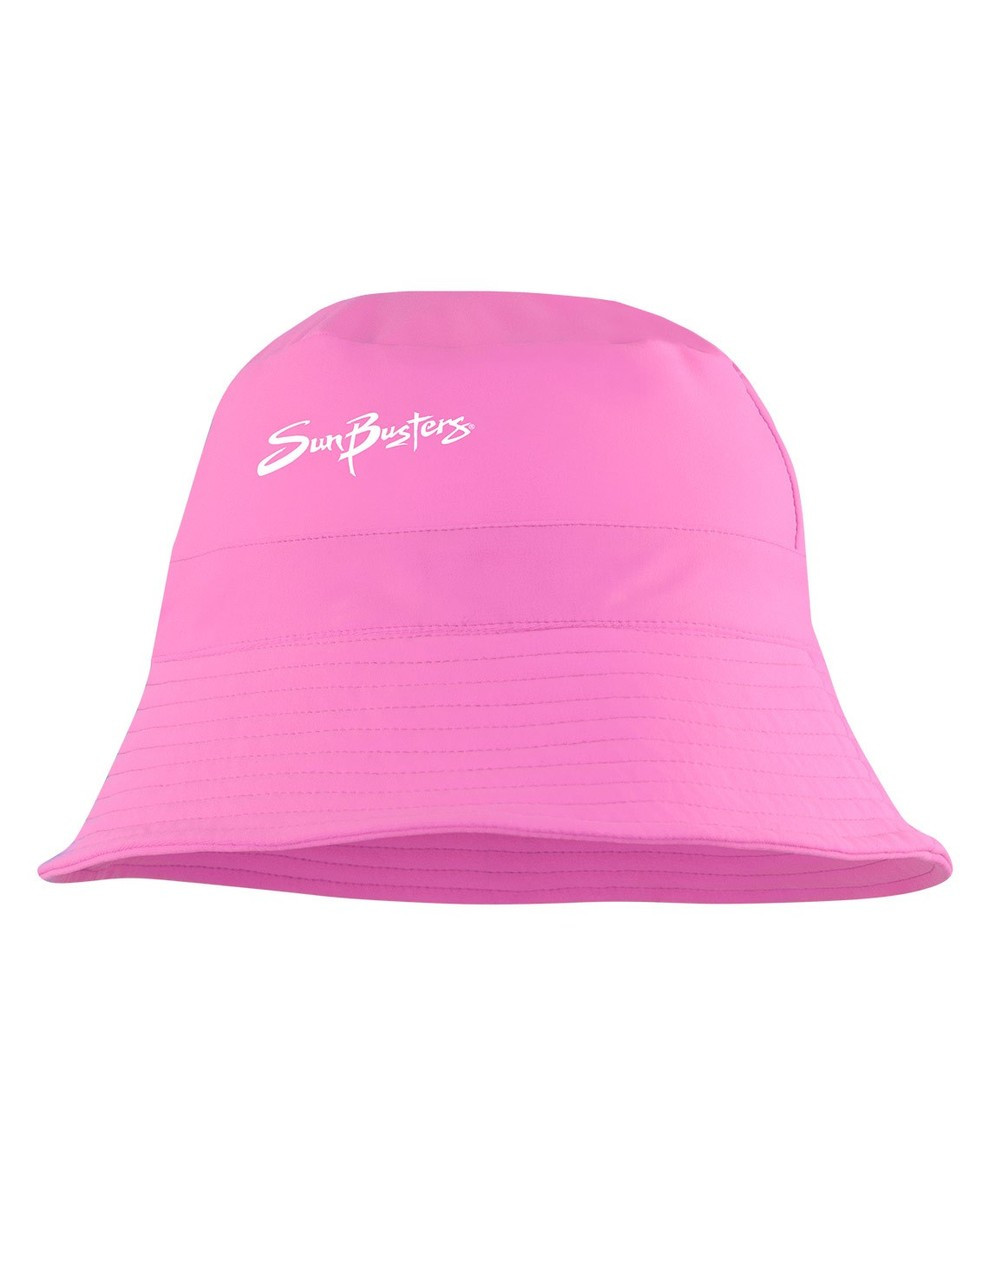 Girls Sun Busters UV Bucket Hat Flamingo  72ee0bf2b33